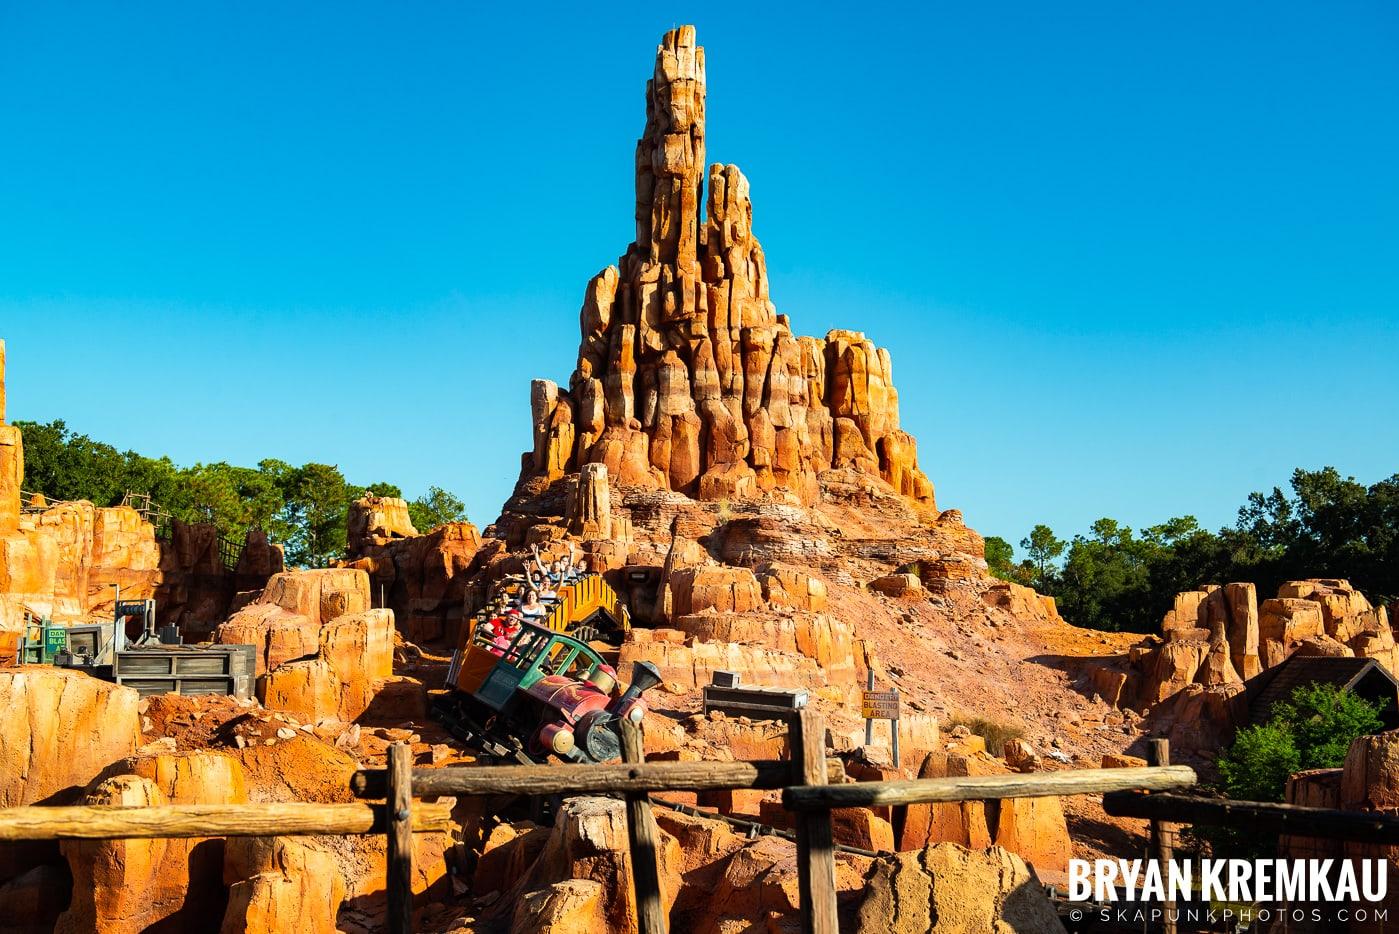 Walt Disney World Vacation: Day 6 (Magic Kingdom, Epcot, Disney's Hollywood Studios) - 10.4.19 (34)